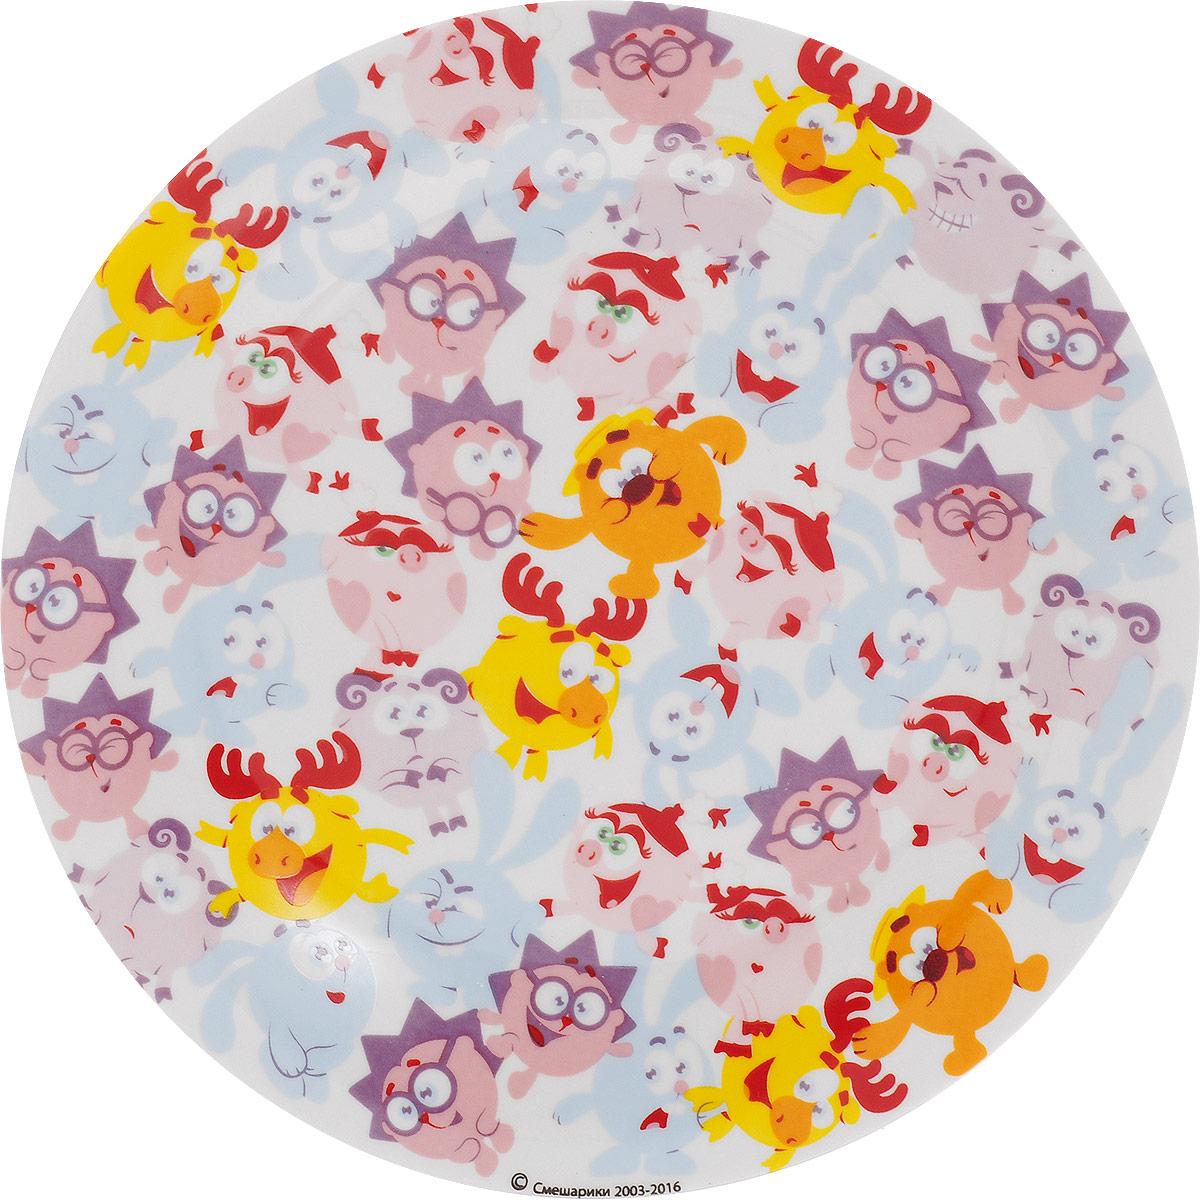 Смешарики Тарелка детская Бум диаметр 19 см смешарики тарелка детская конфеты диаметр 19 5 см